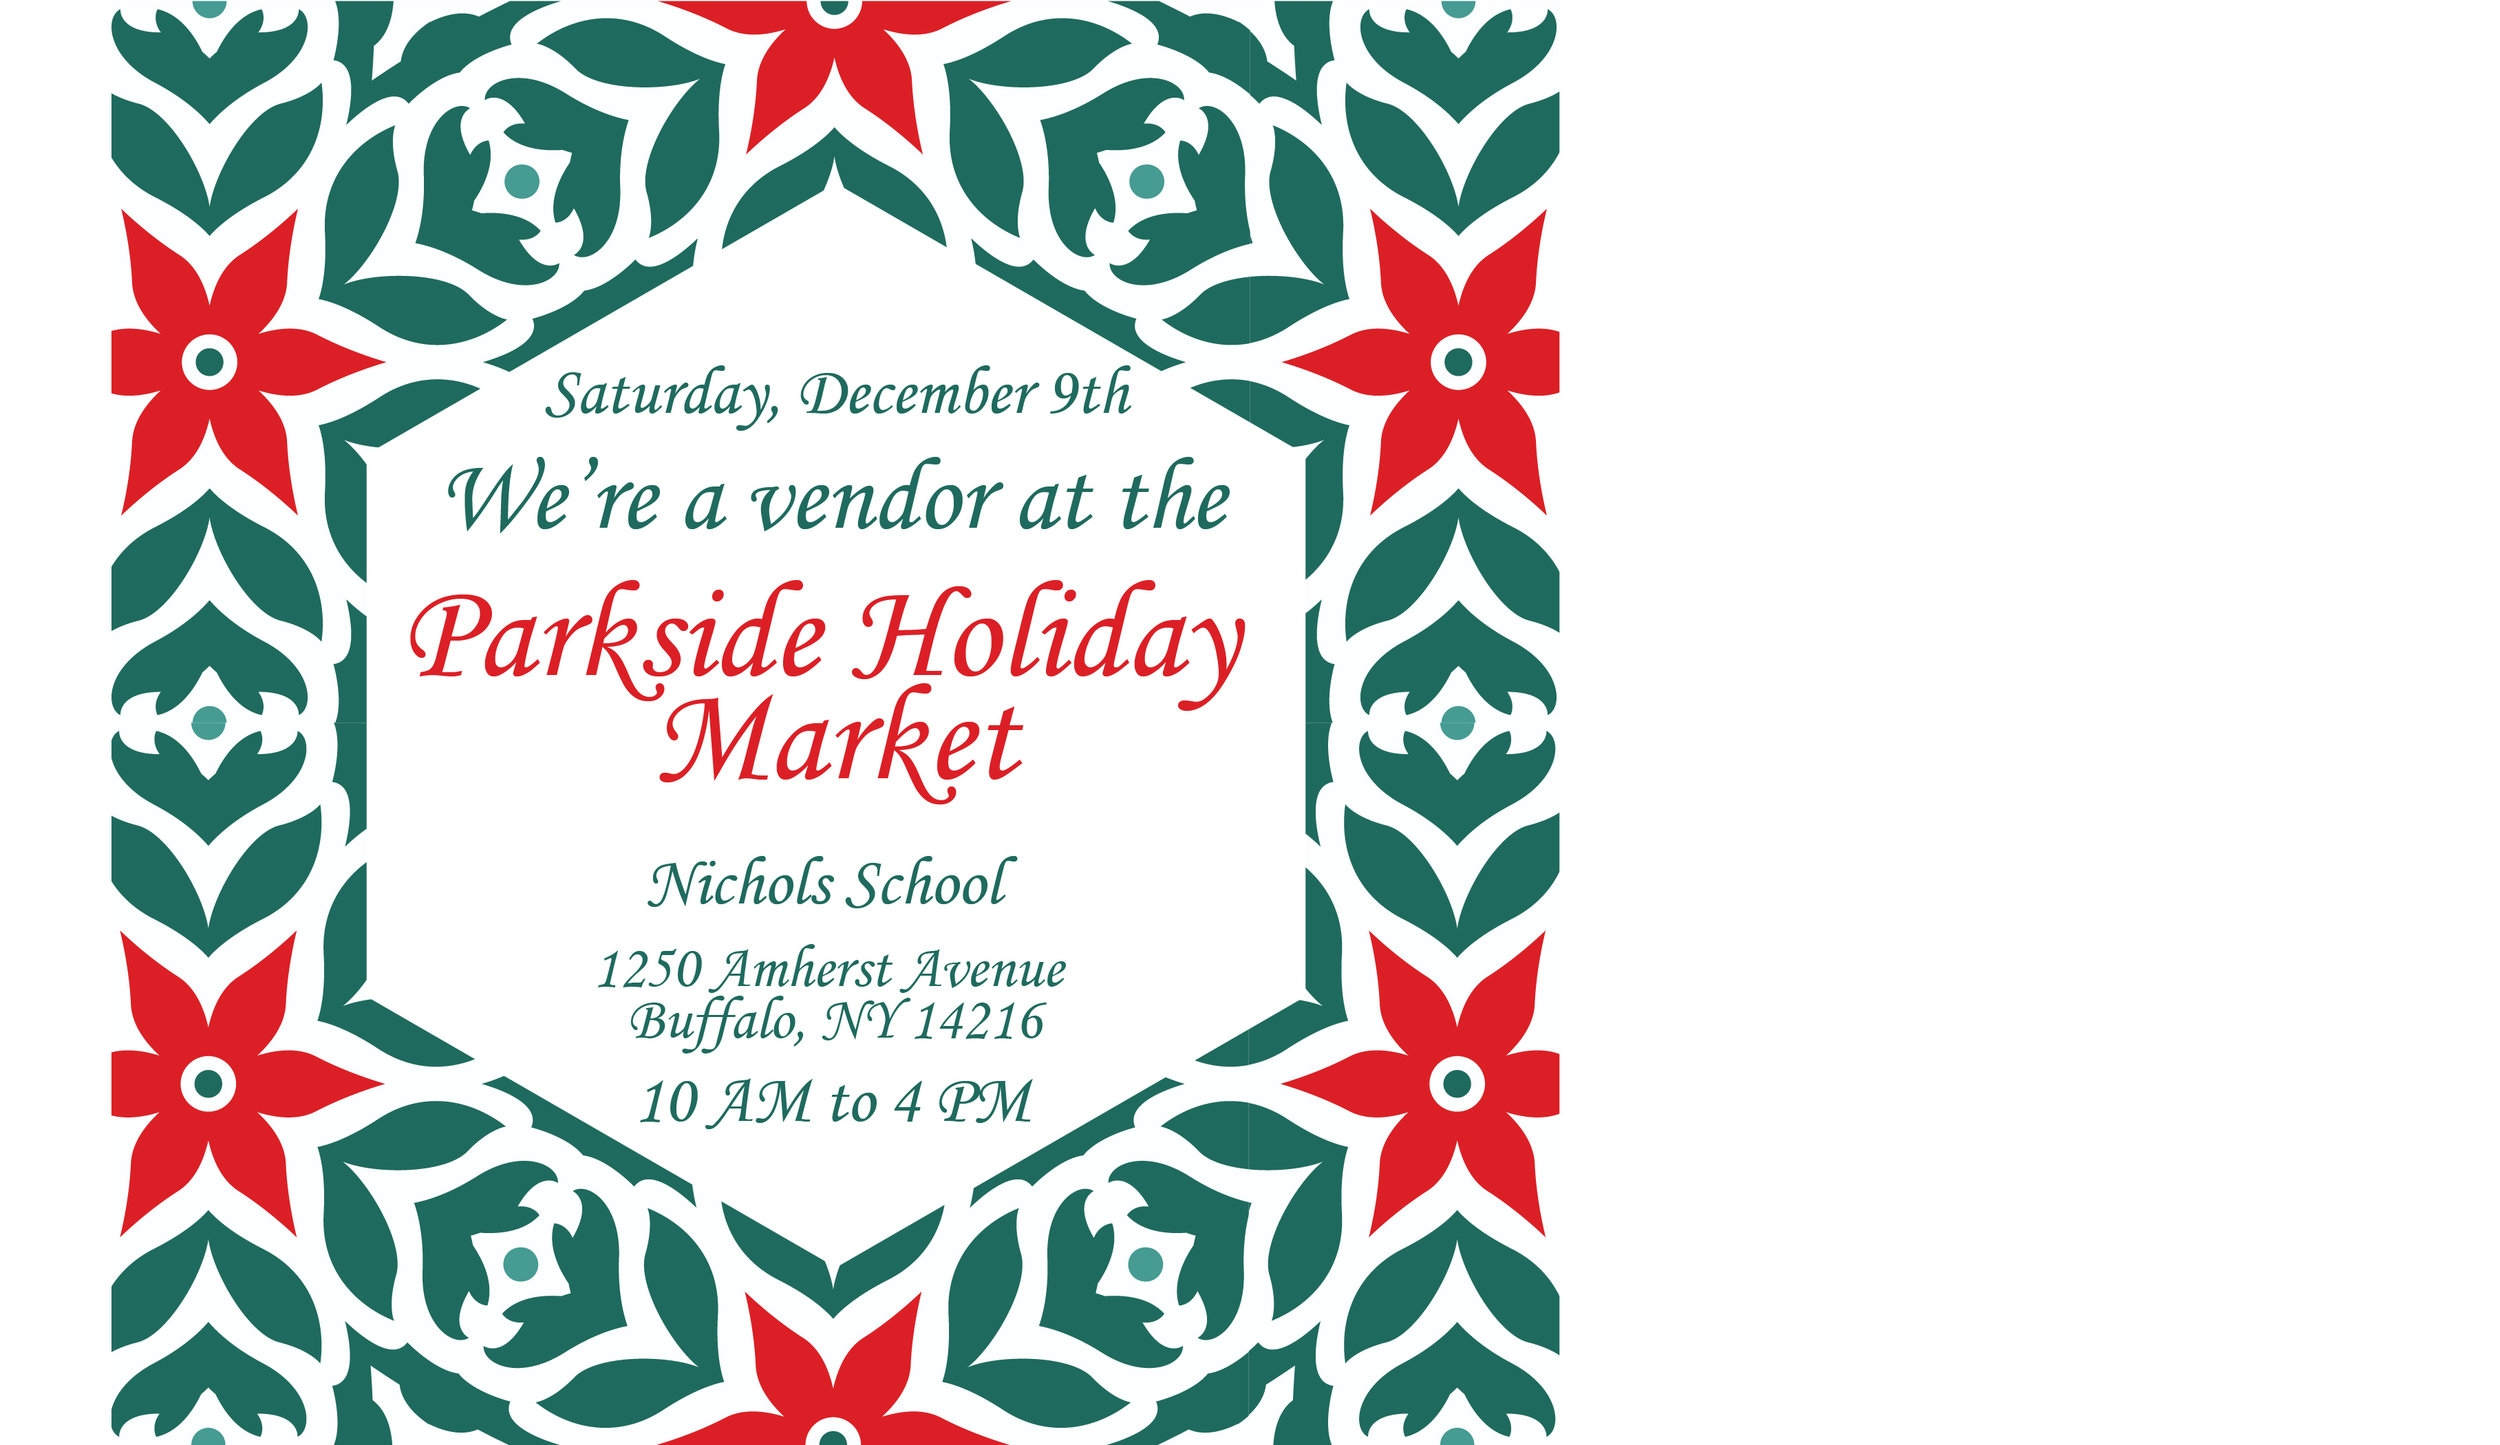 Parkside Holiday Market Ad.jpg